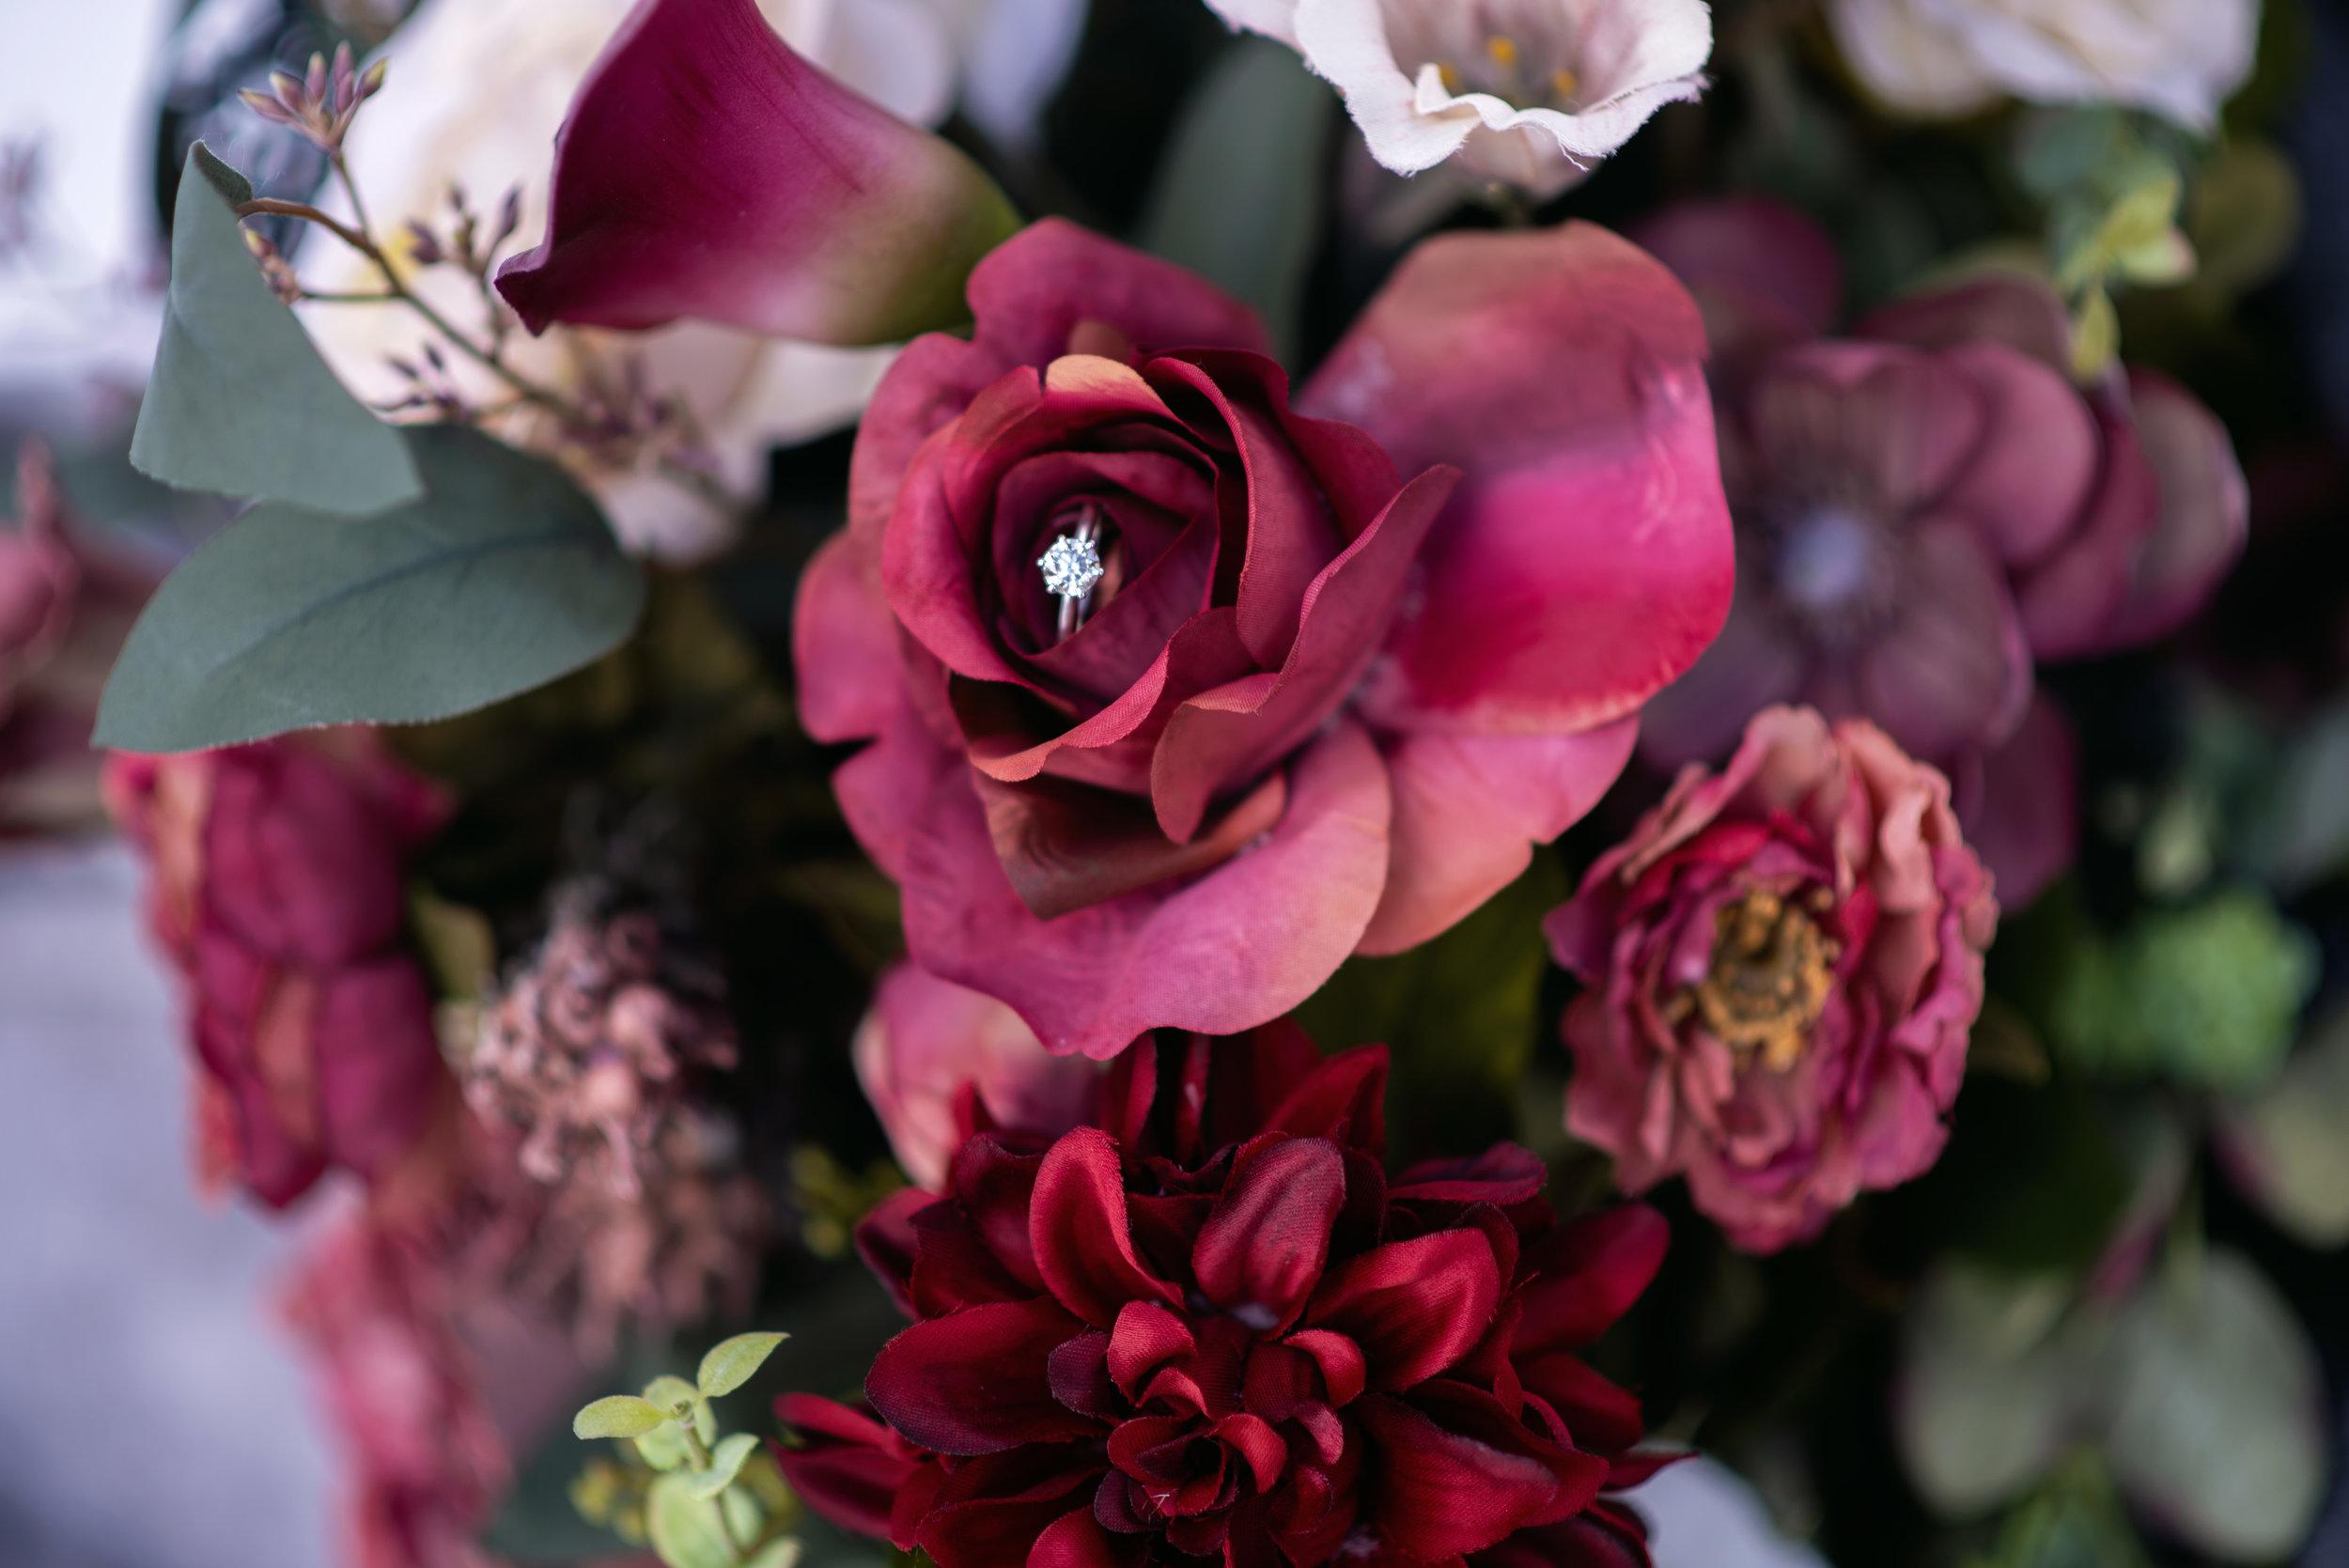 breelle_hilsenrath_photography_burgundy_floral_bouquet.jpg